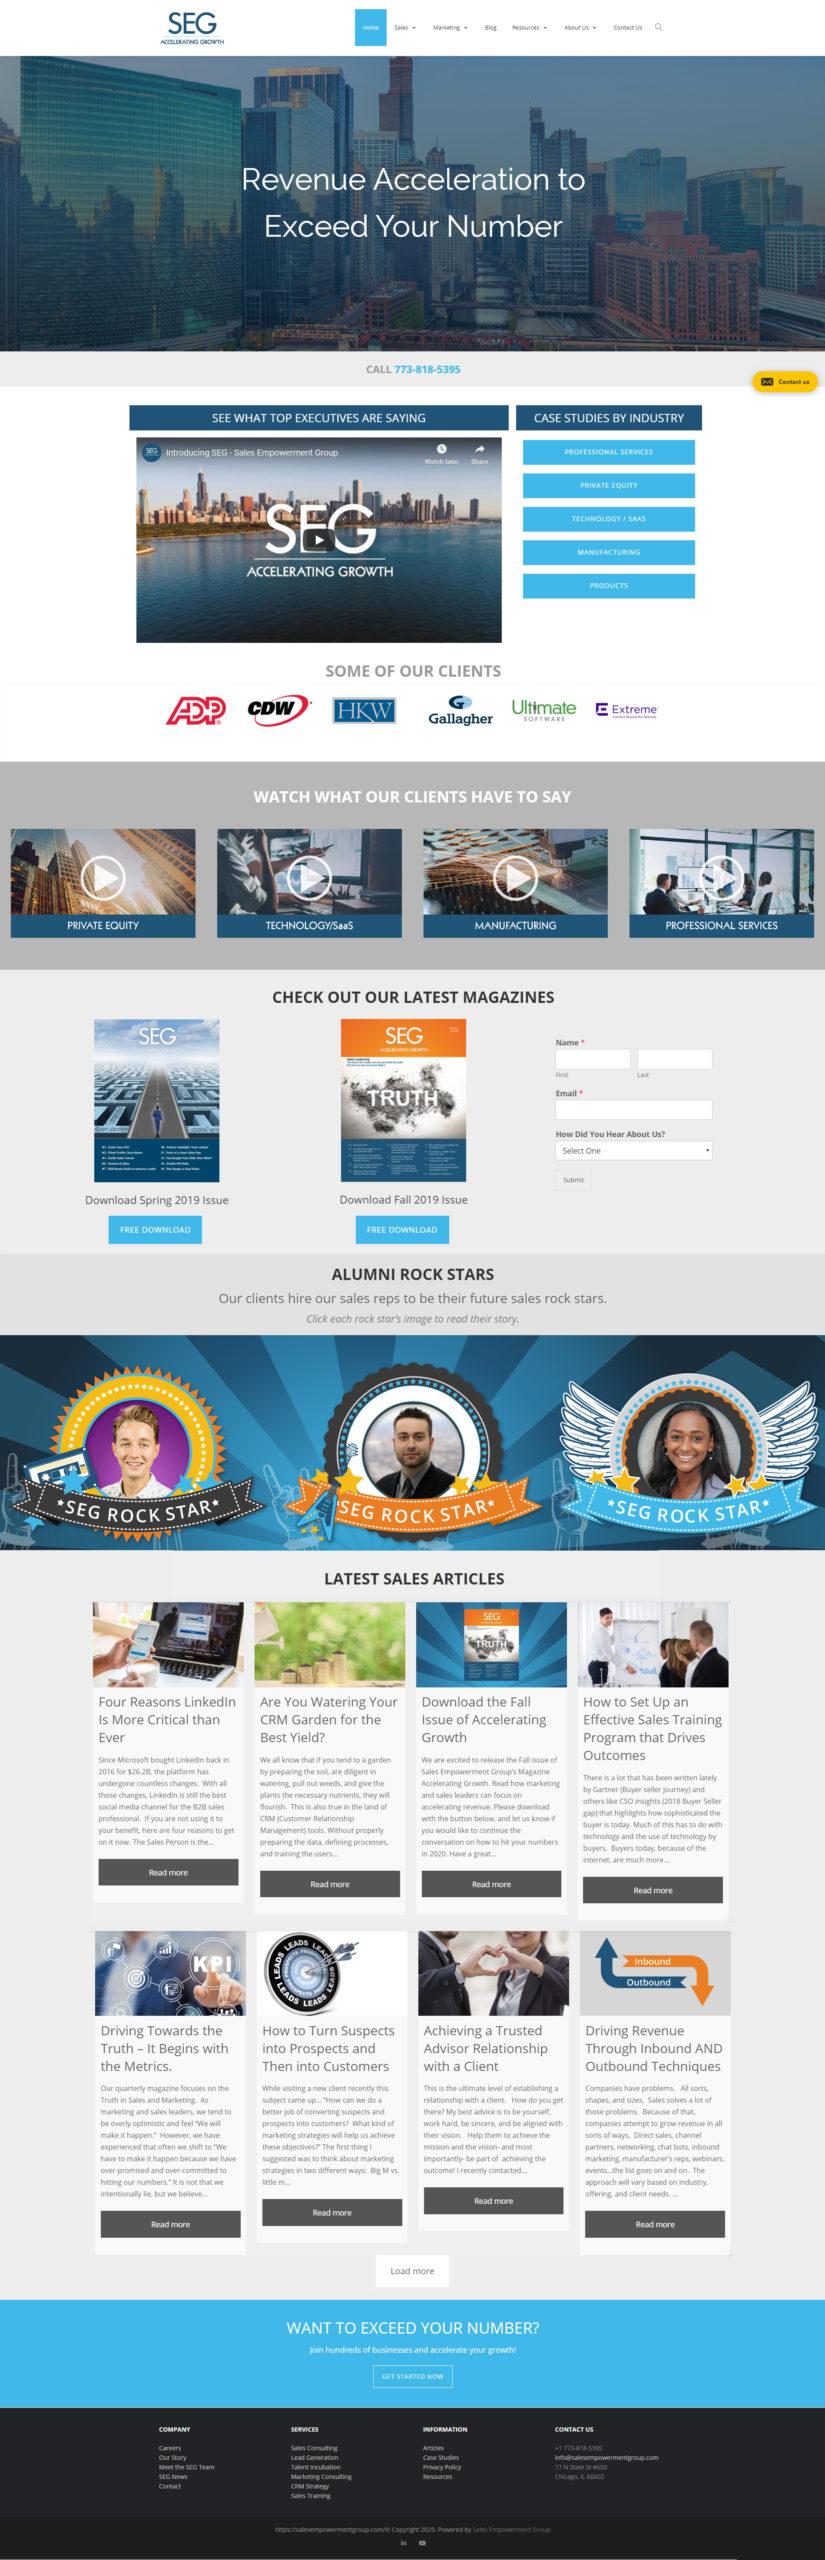 Sales Empowerment Group Site Design